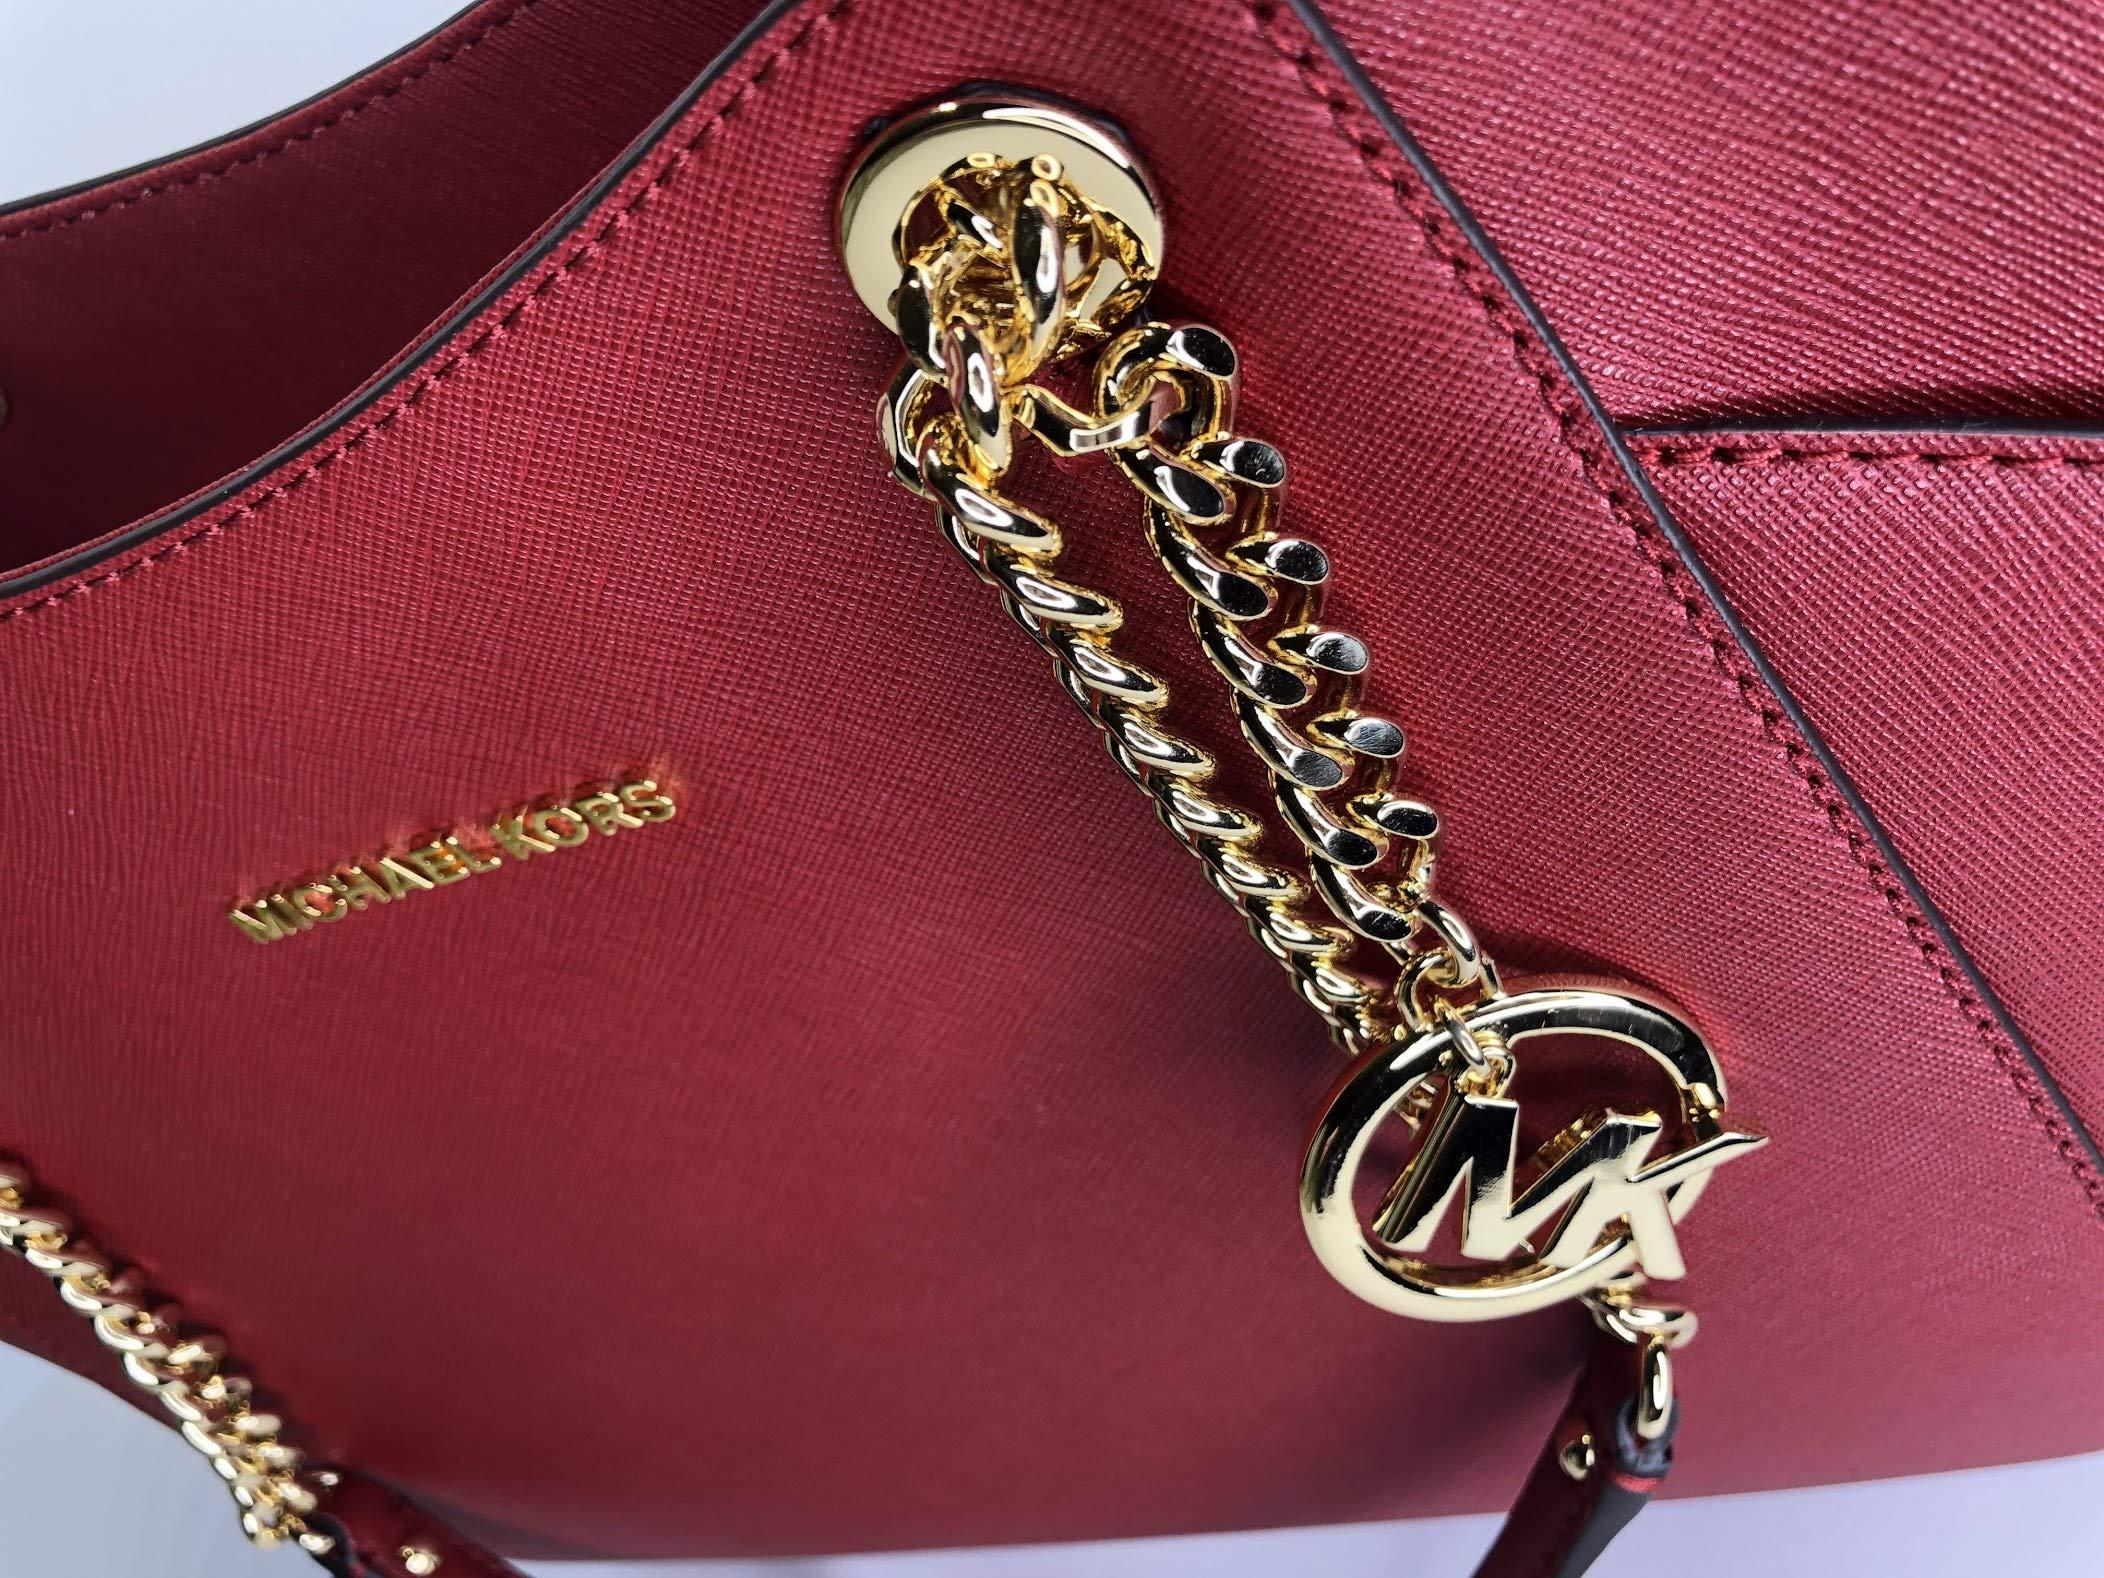 MICHAEL Michael Kors Jet Set Travel Large Chain Shoulder Tote bundled with Large Flat MF Phone Case Wallet Wristlet (Scarlet) by Michael Kors (Image #7)